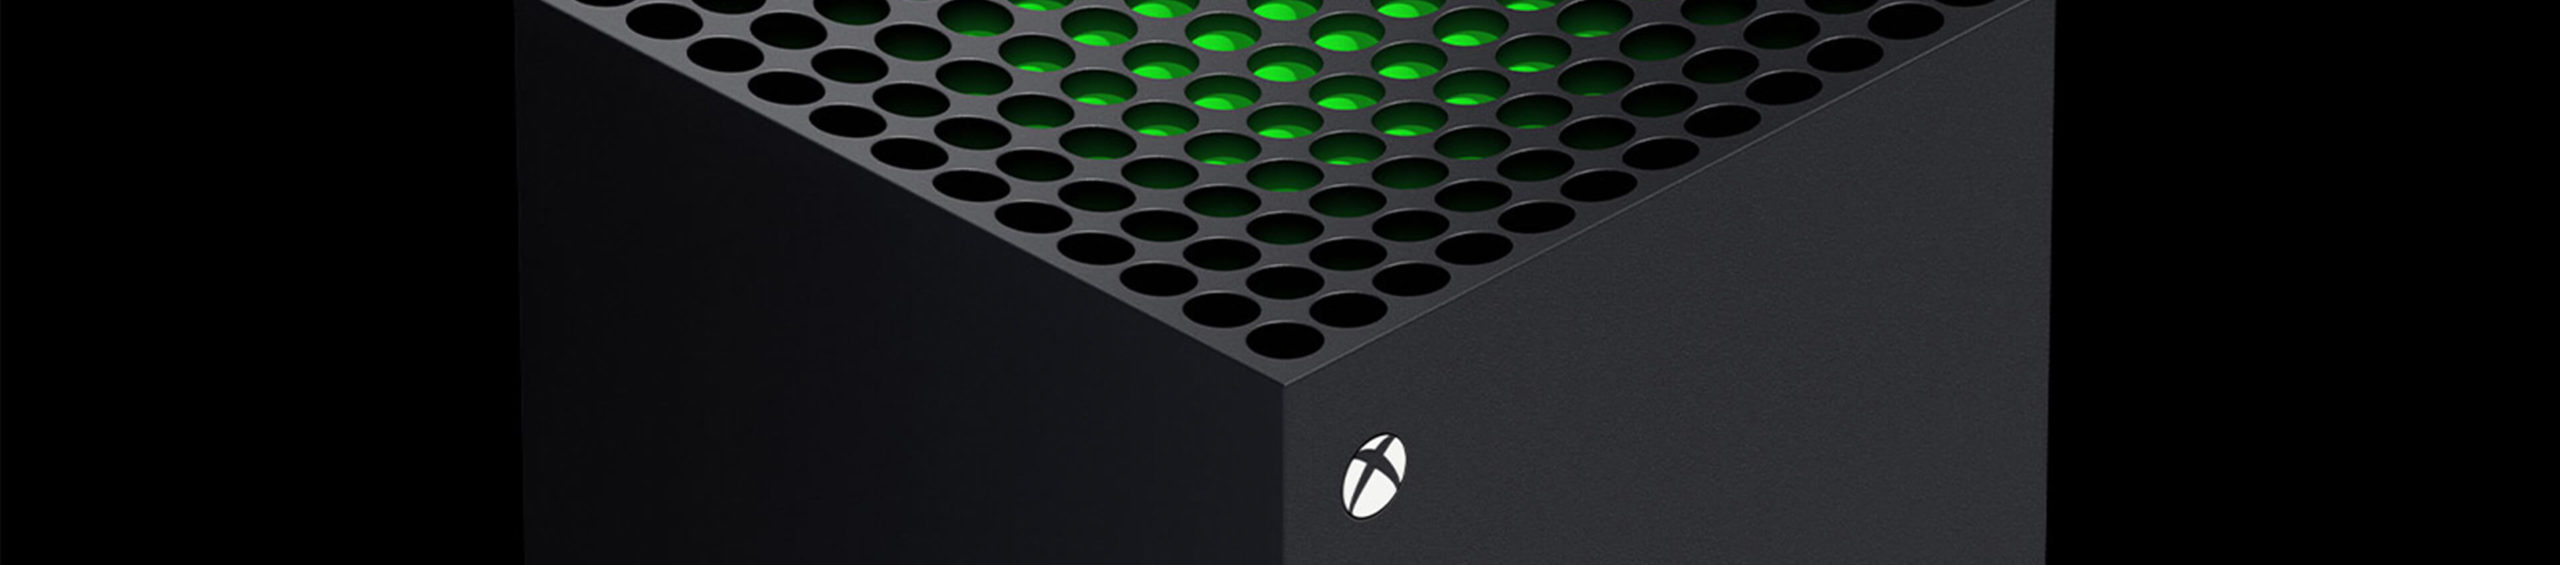 Black Friday Xbox Series X